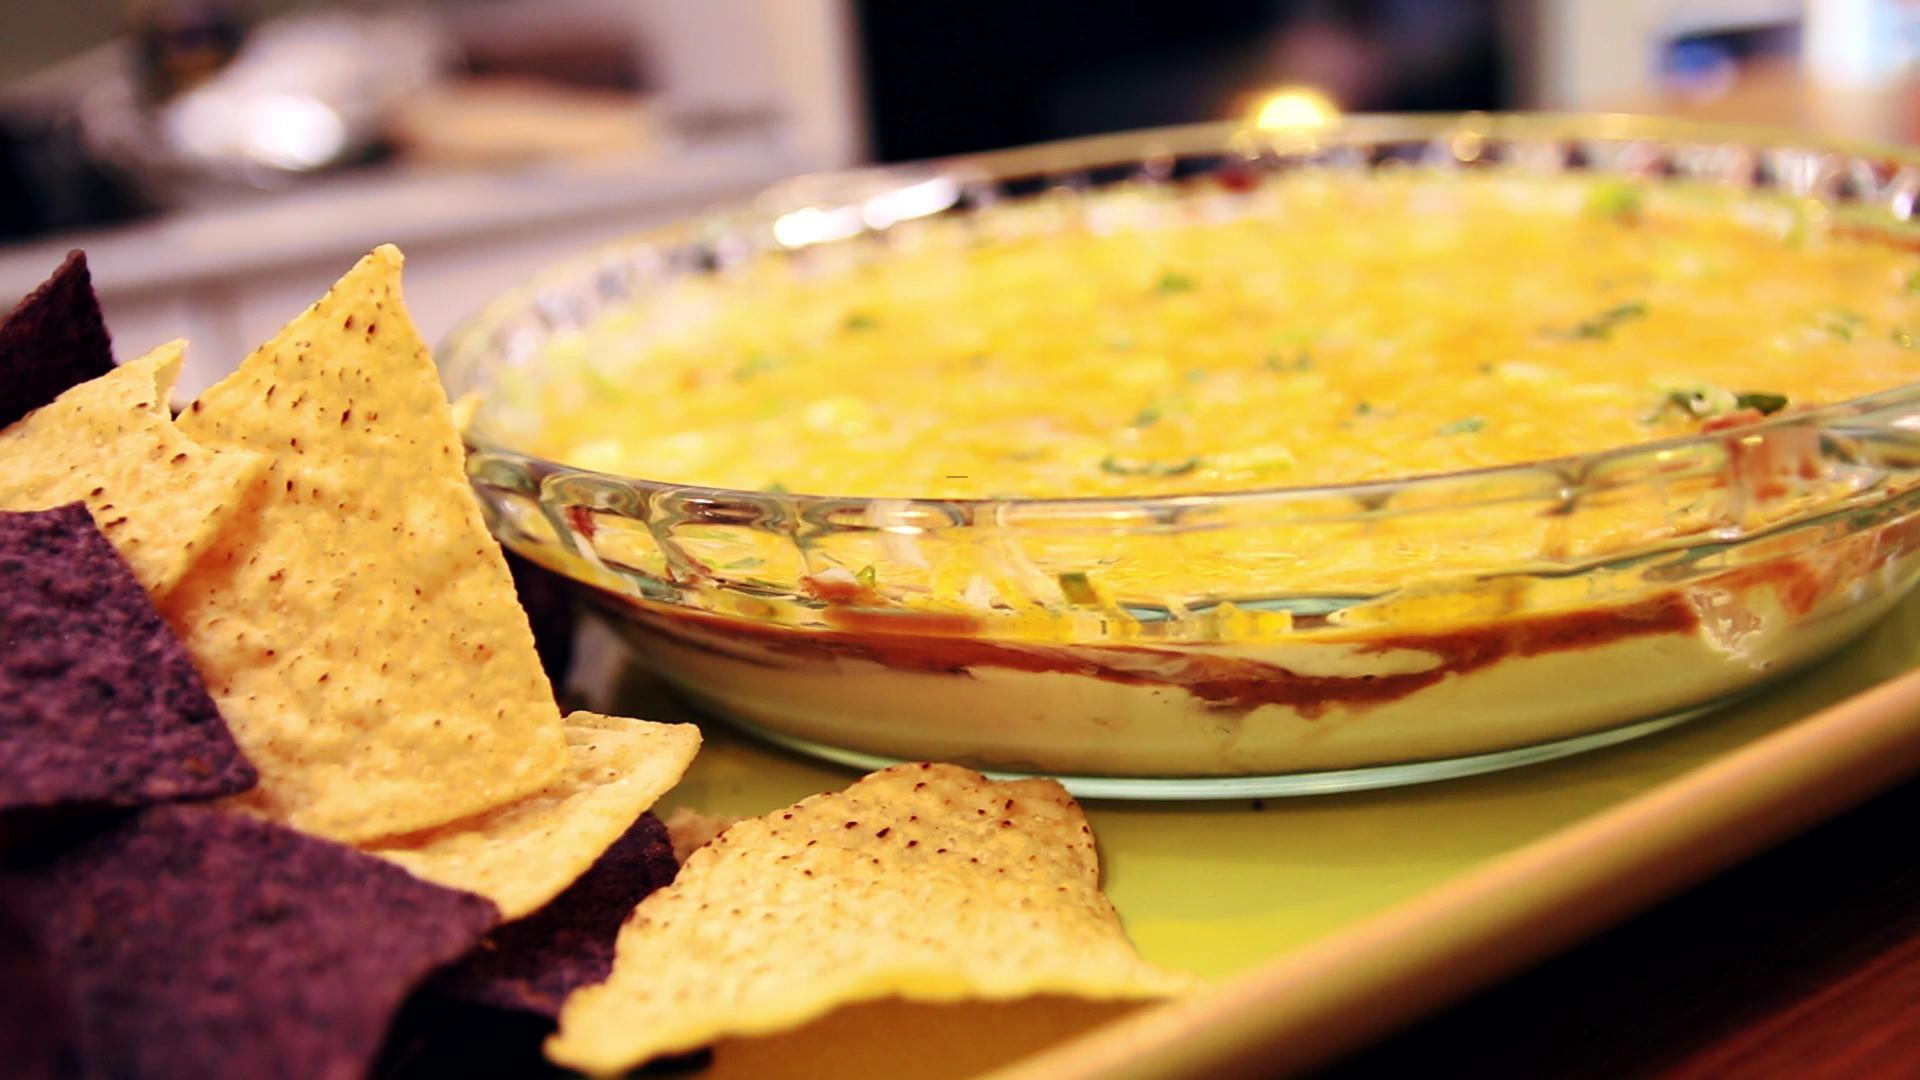 Unbelievably Cheesy Refried Bean Dip